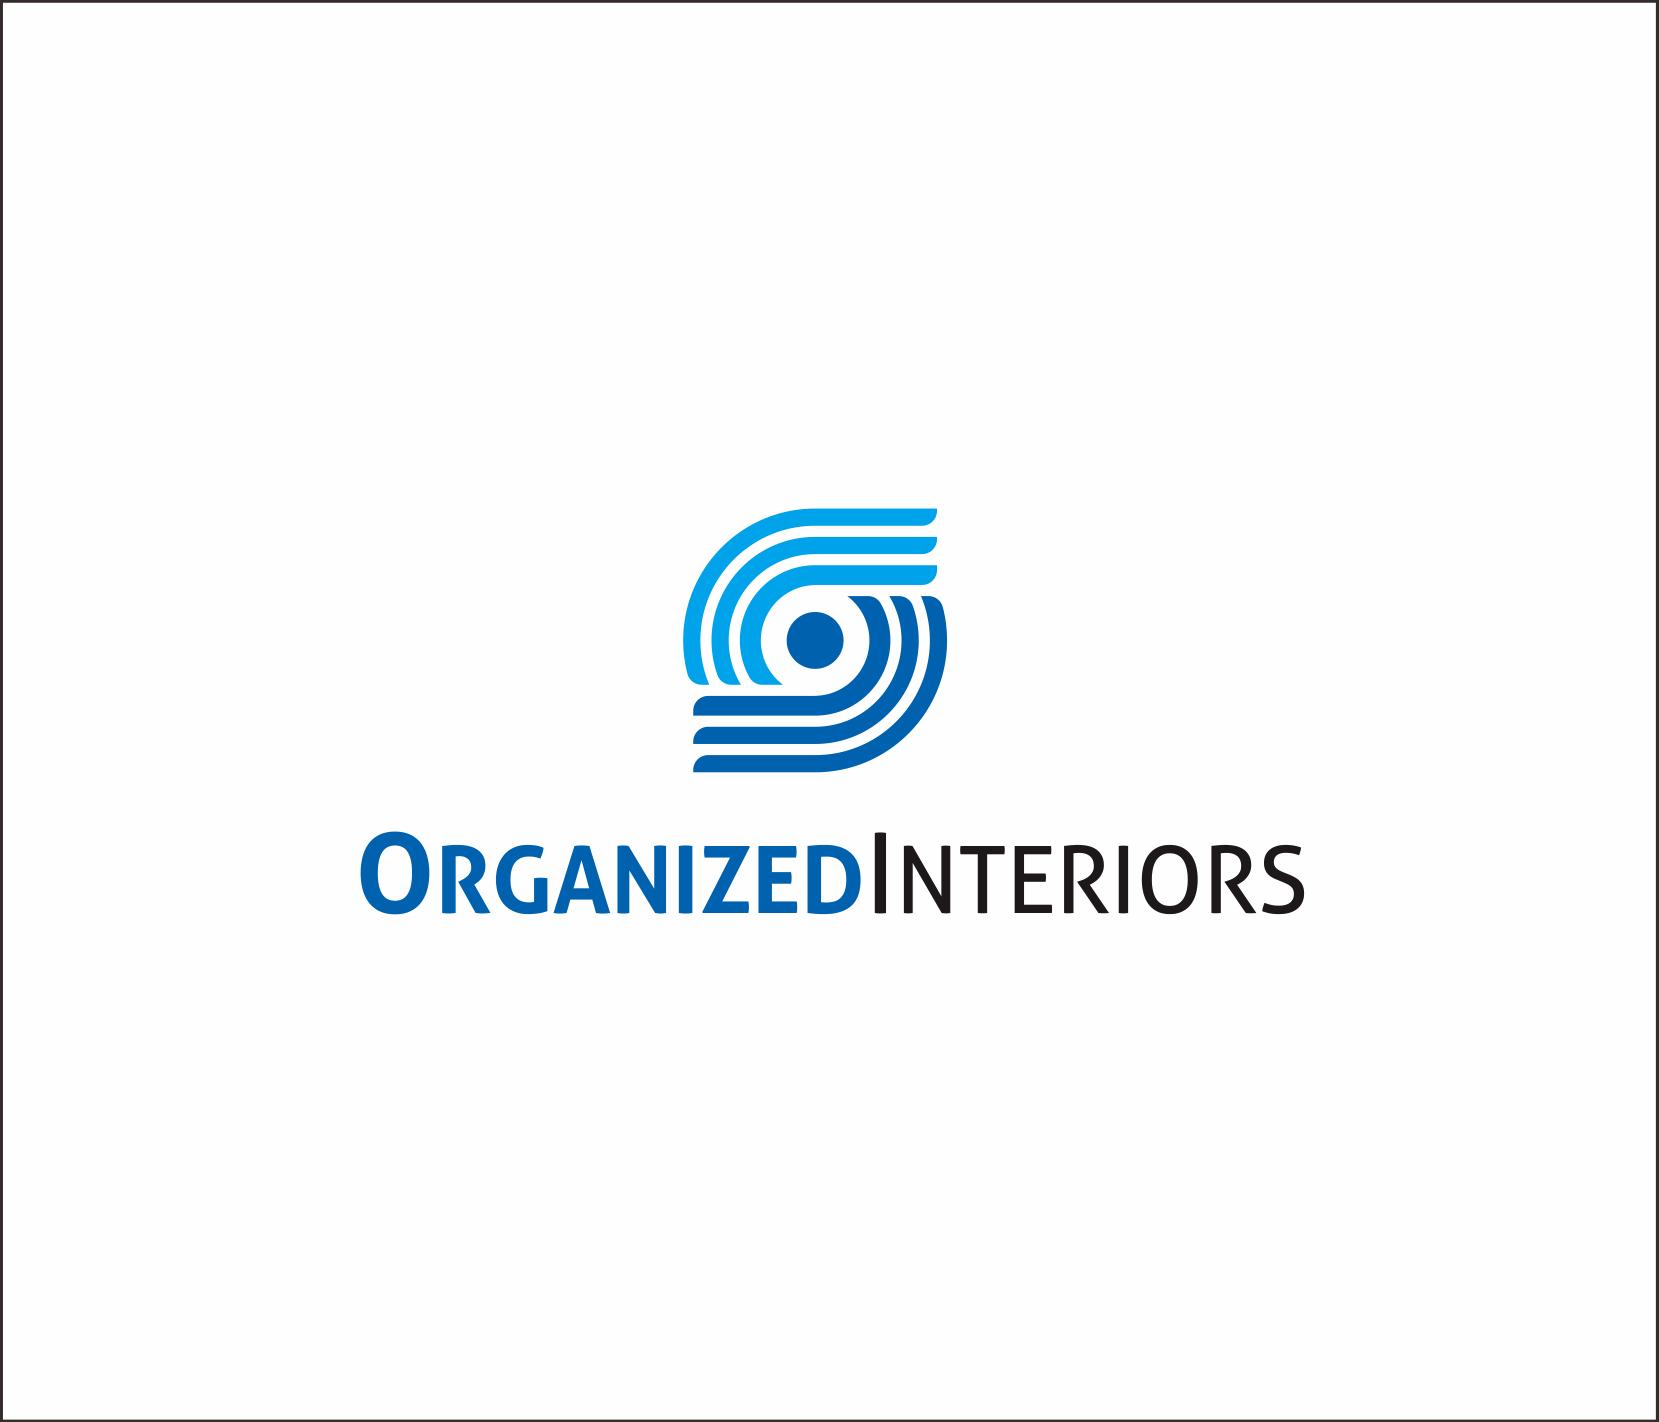 Logo Design by Armada Jamaluddin - Entry No. 122 in the Logo Design Contest Imaginative Logo Design for Organized Interiors.